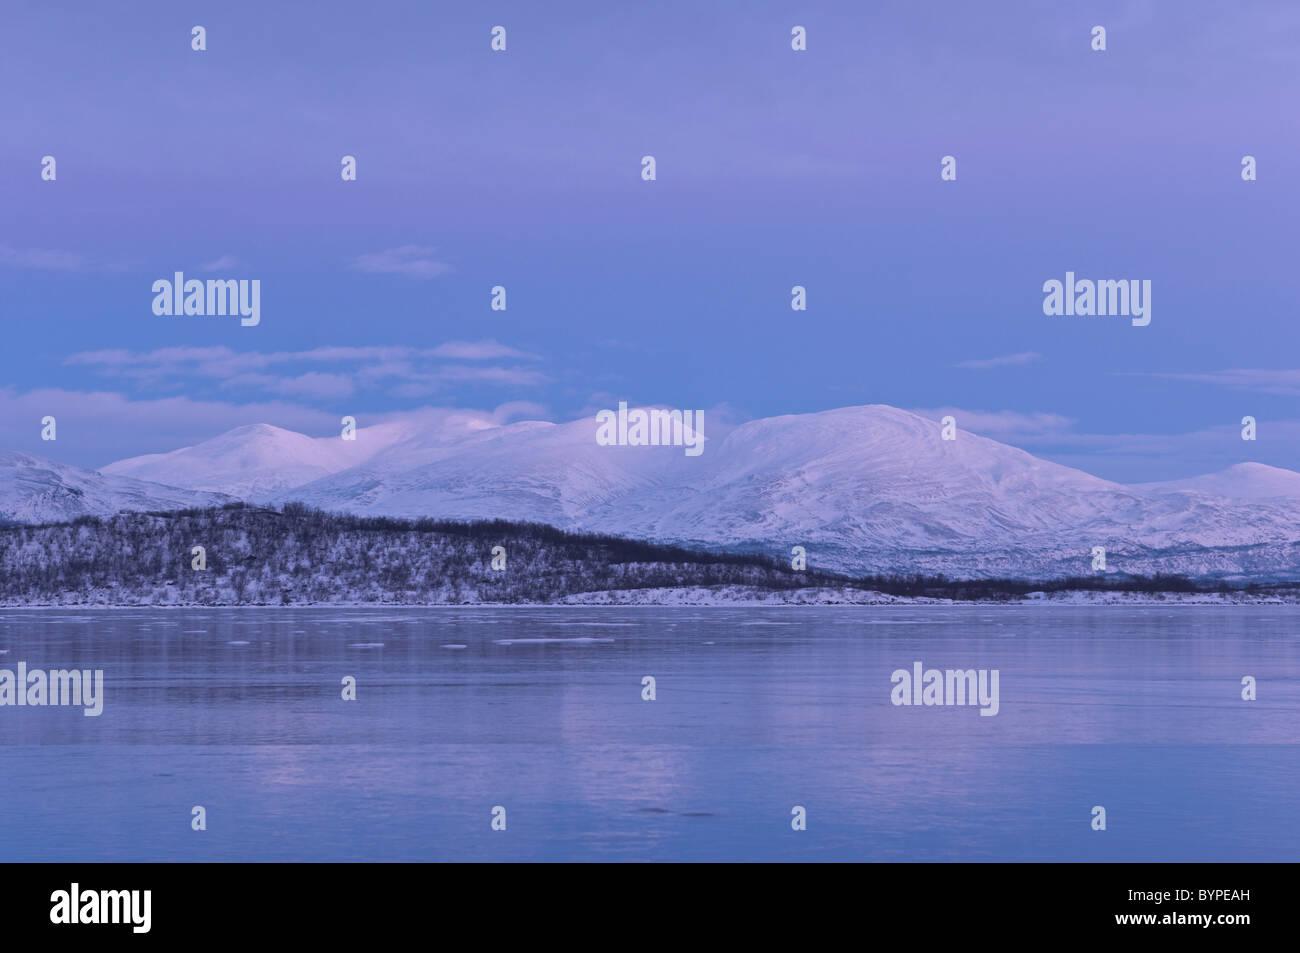 Berge im Fjaell  See Tornetraesk, Abisko, Lappland, frozen lake tornetraesk, abisko, lapland, sweden - Stock Image